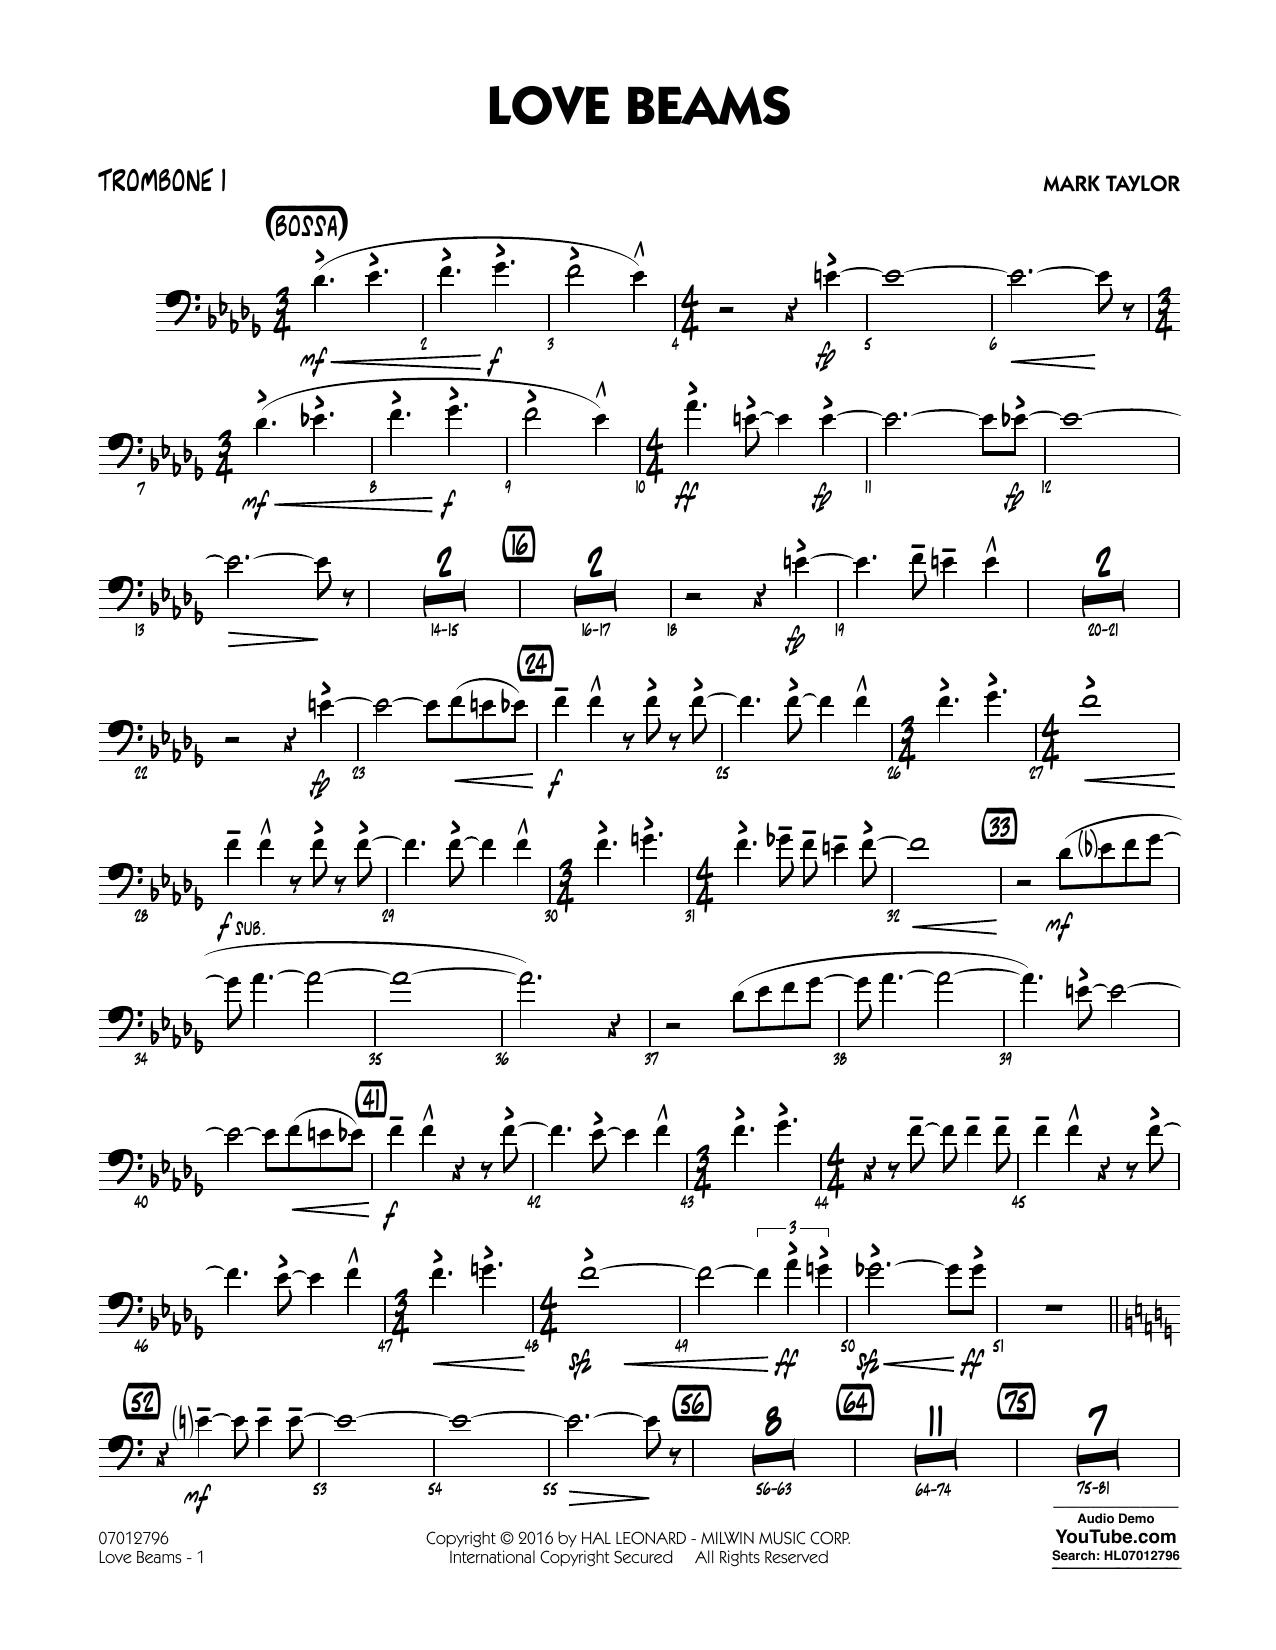 Love Beams - Trombone 1